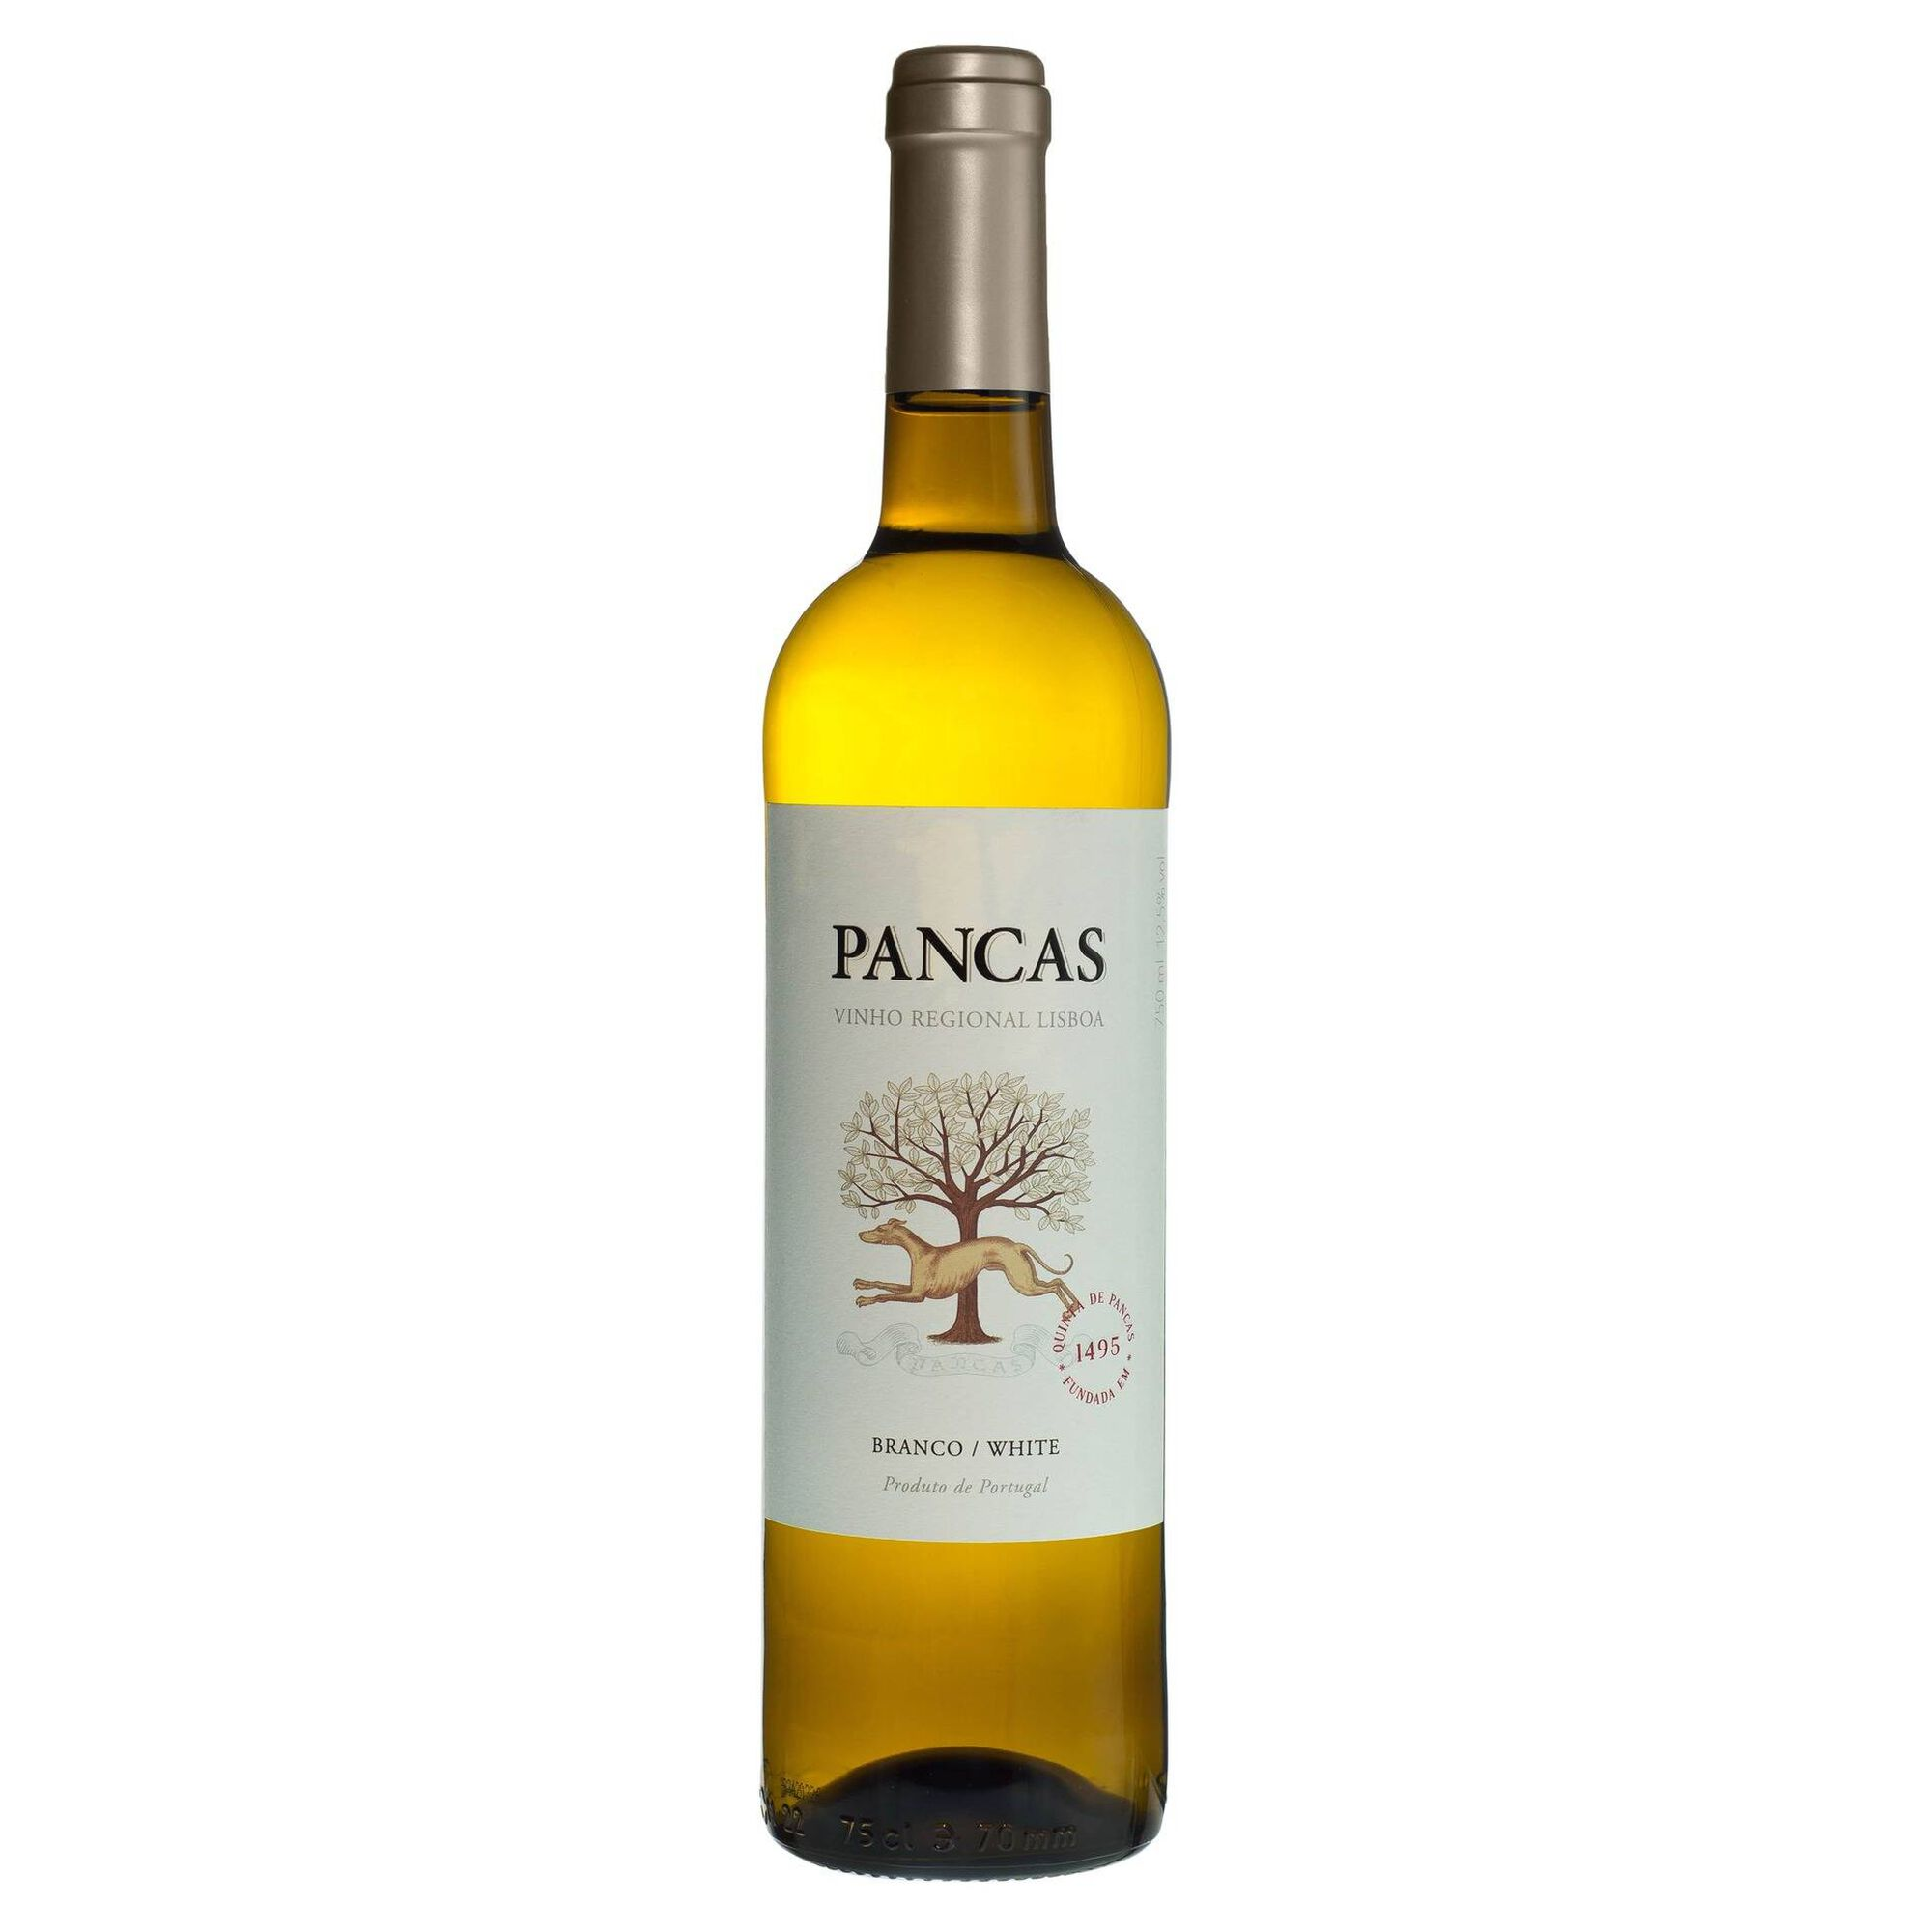 Pancas Regional Lisboa Vinho Branco